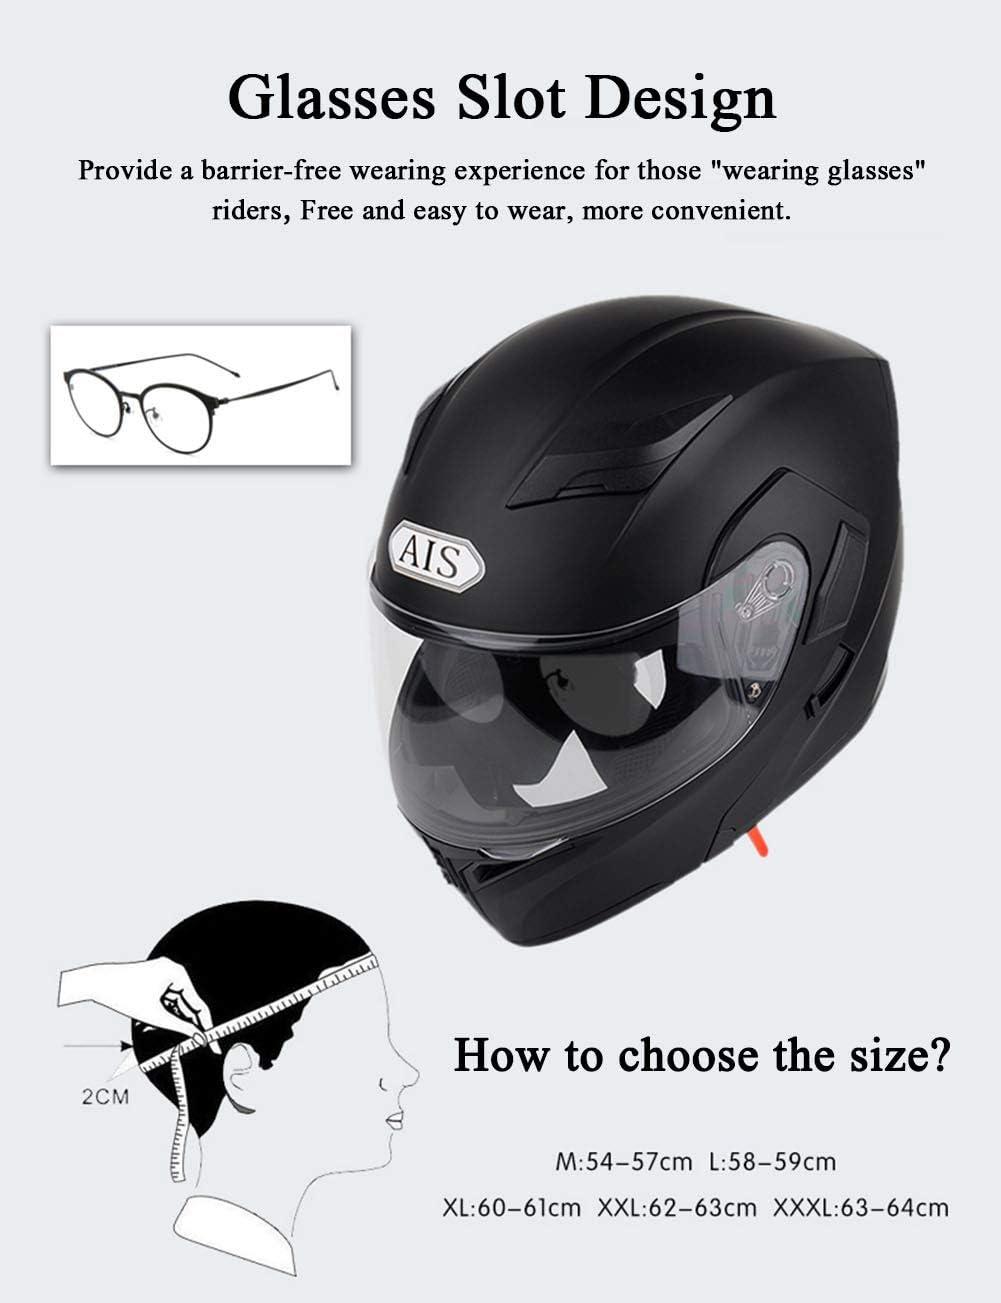 MENUDOWN Motorradhelm,mit R/ücklicht,Motorrad-Klapphelm,Motorrad-Integralhelm Bluetooth mit doppelter Sonnenblende Motorrad Harley Scooter Biker Klapphelm,Bright Black-M